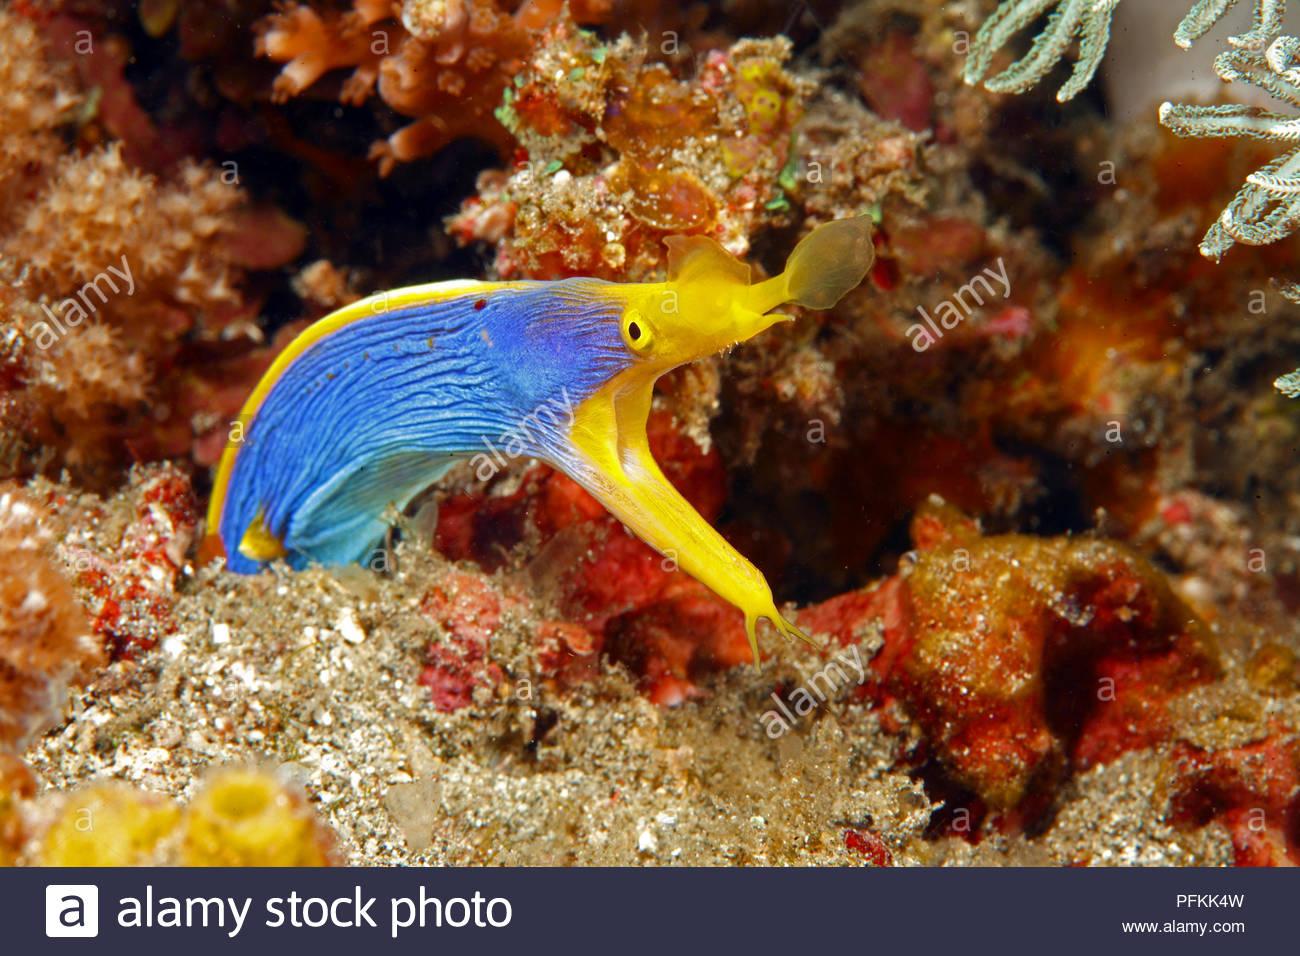 Nasenmuraene (Rhinomuraena quaesita) im Korallenriff, Borneo, Malaysia | Ribbon eel (Rhinomuraena quaesita) at coral reef, Borneo, Malaysia Stock Photo